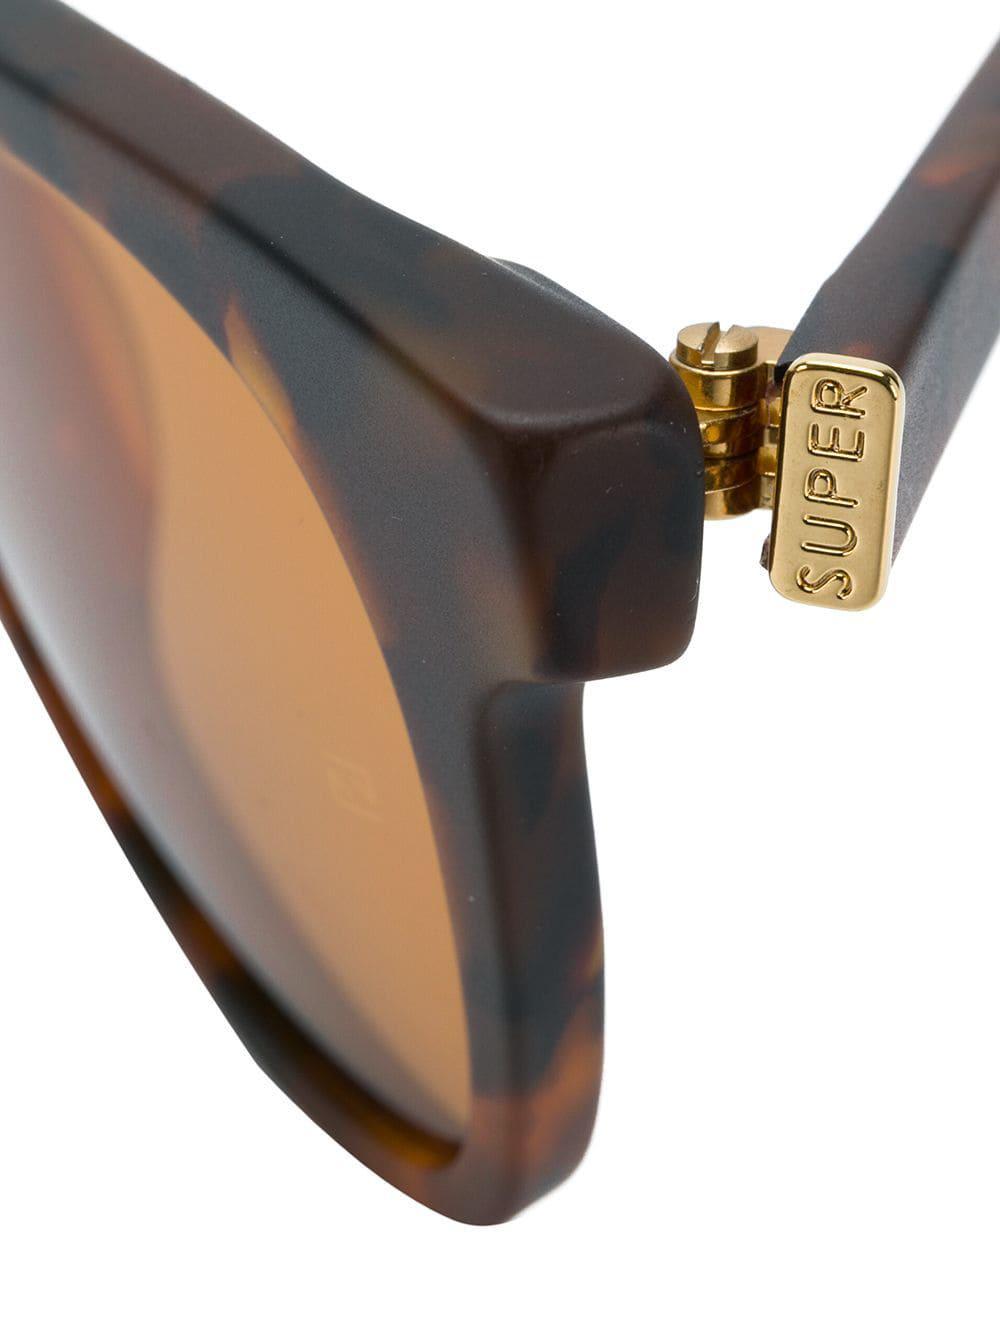 Retrosuperfuture Man Team Sunglasses in Brown